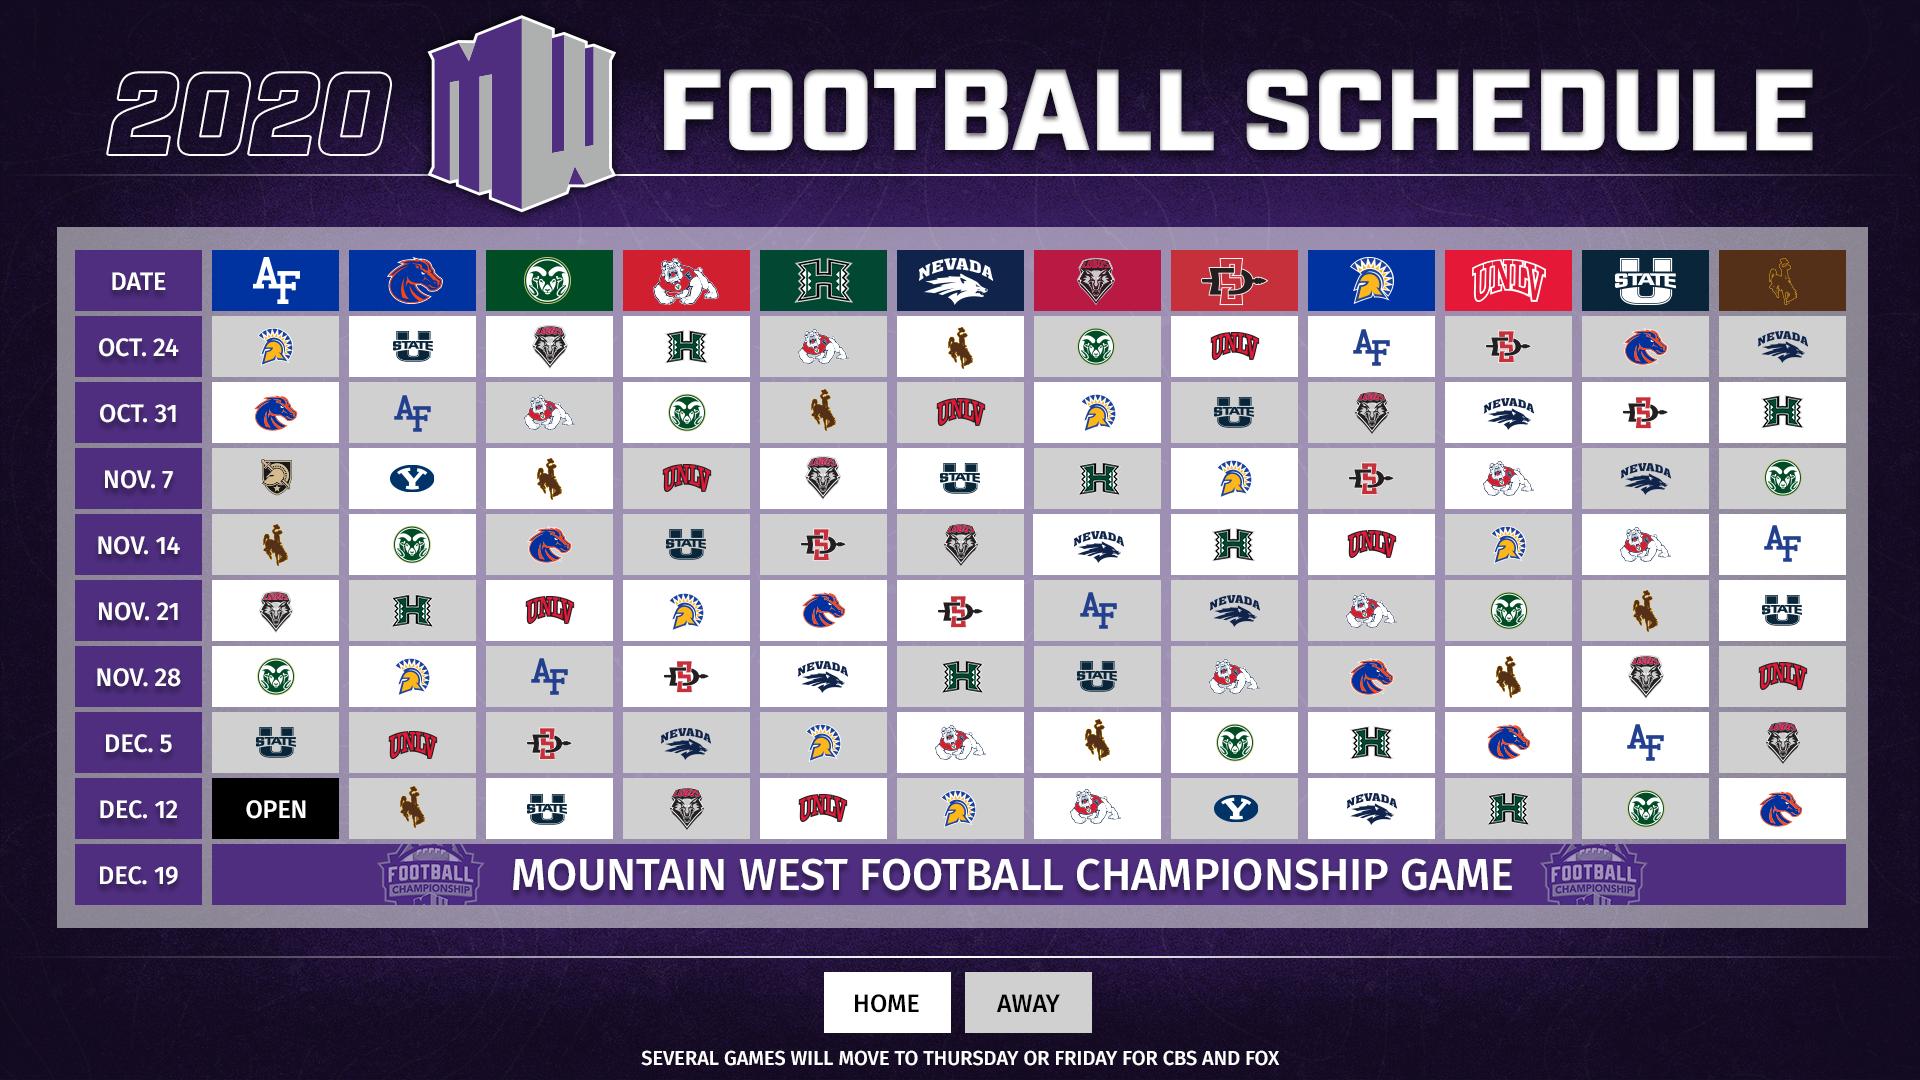 Mountain West Announces 2020 Football Schedule - Mountain regarding Printable 2021 Nfl Schedule